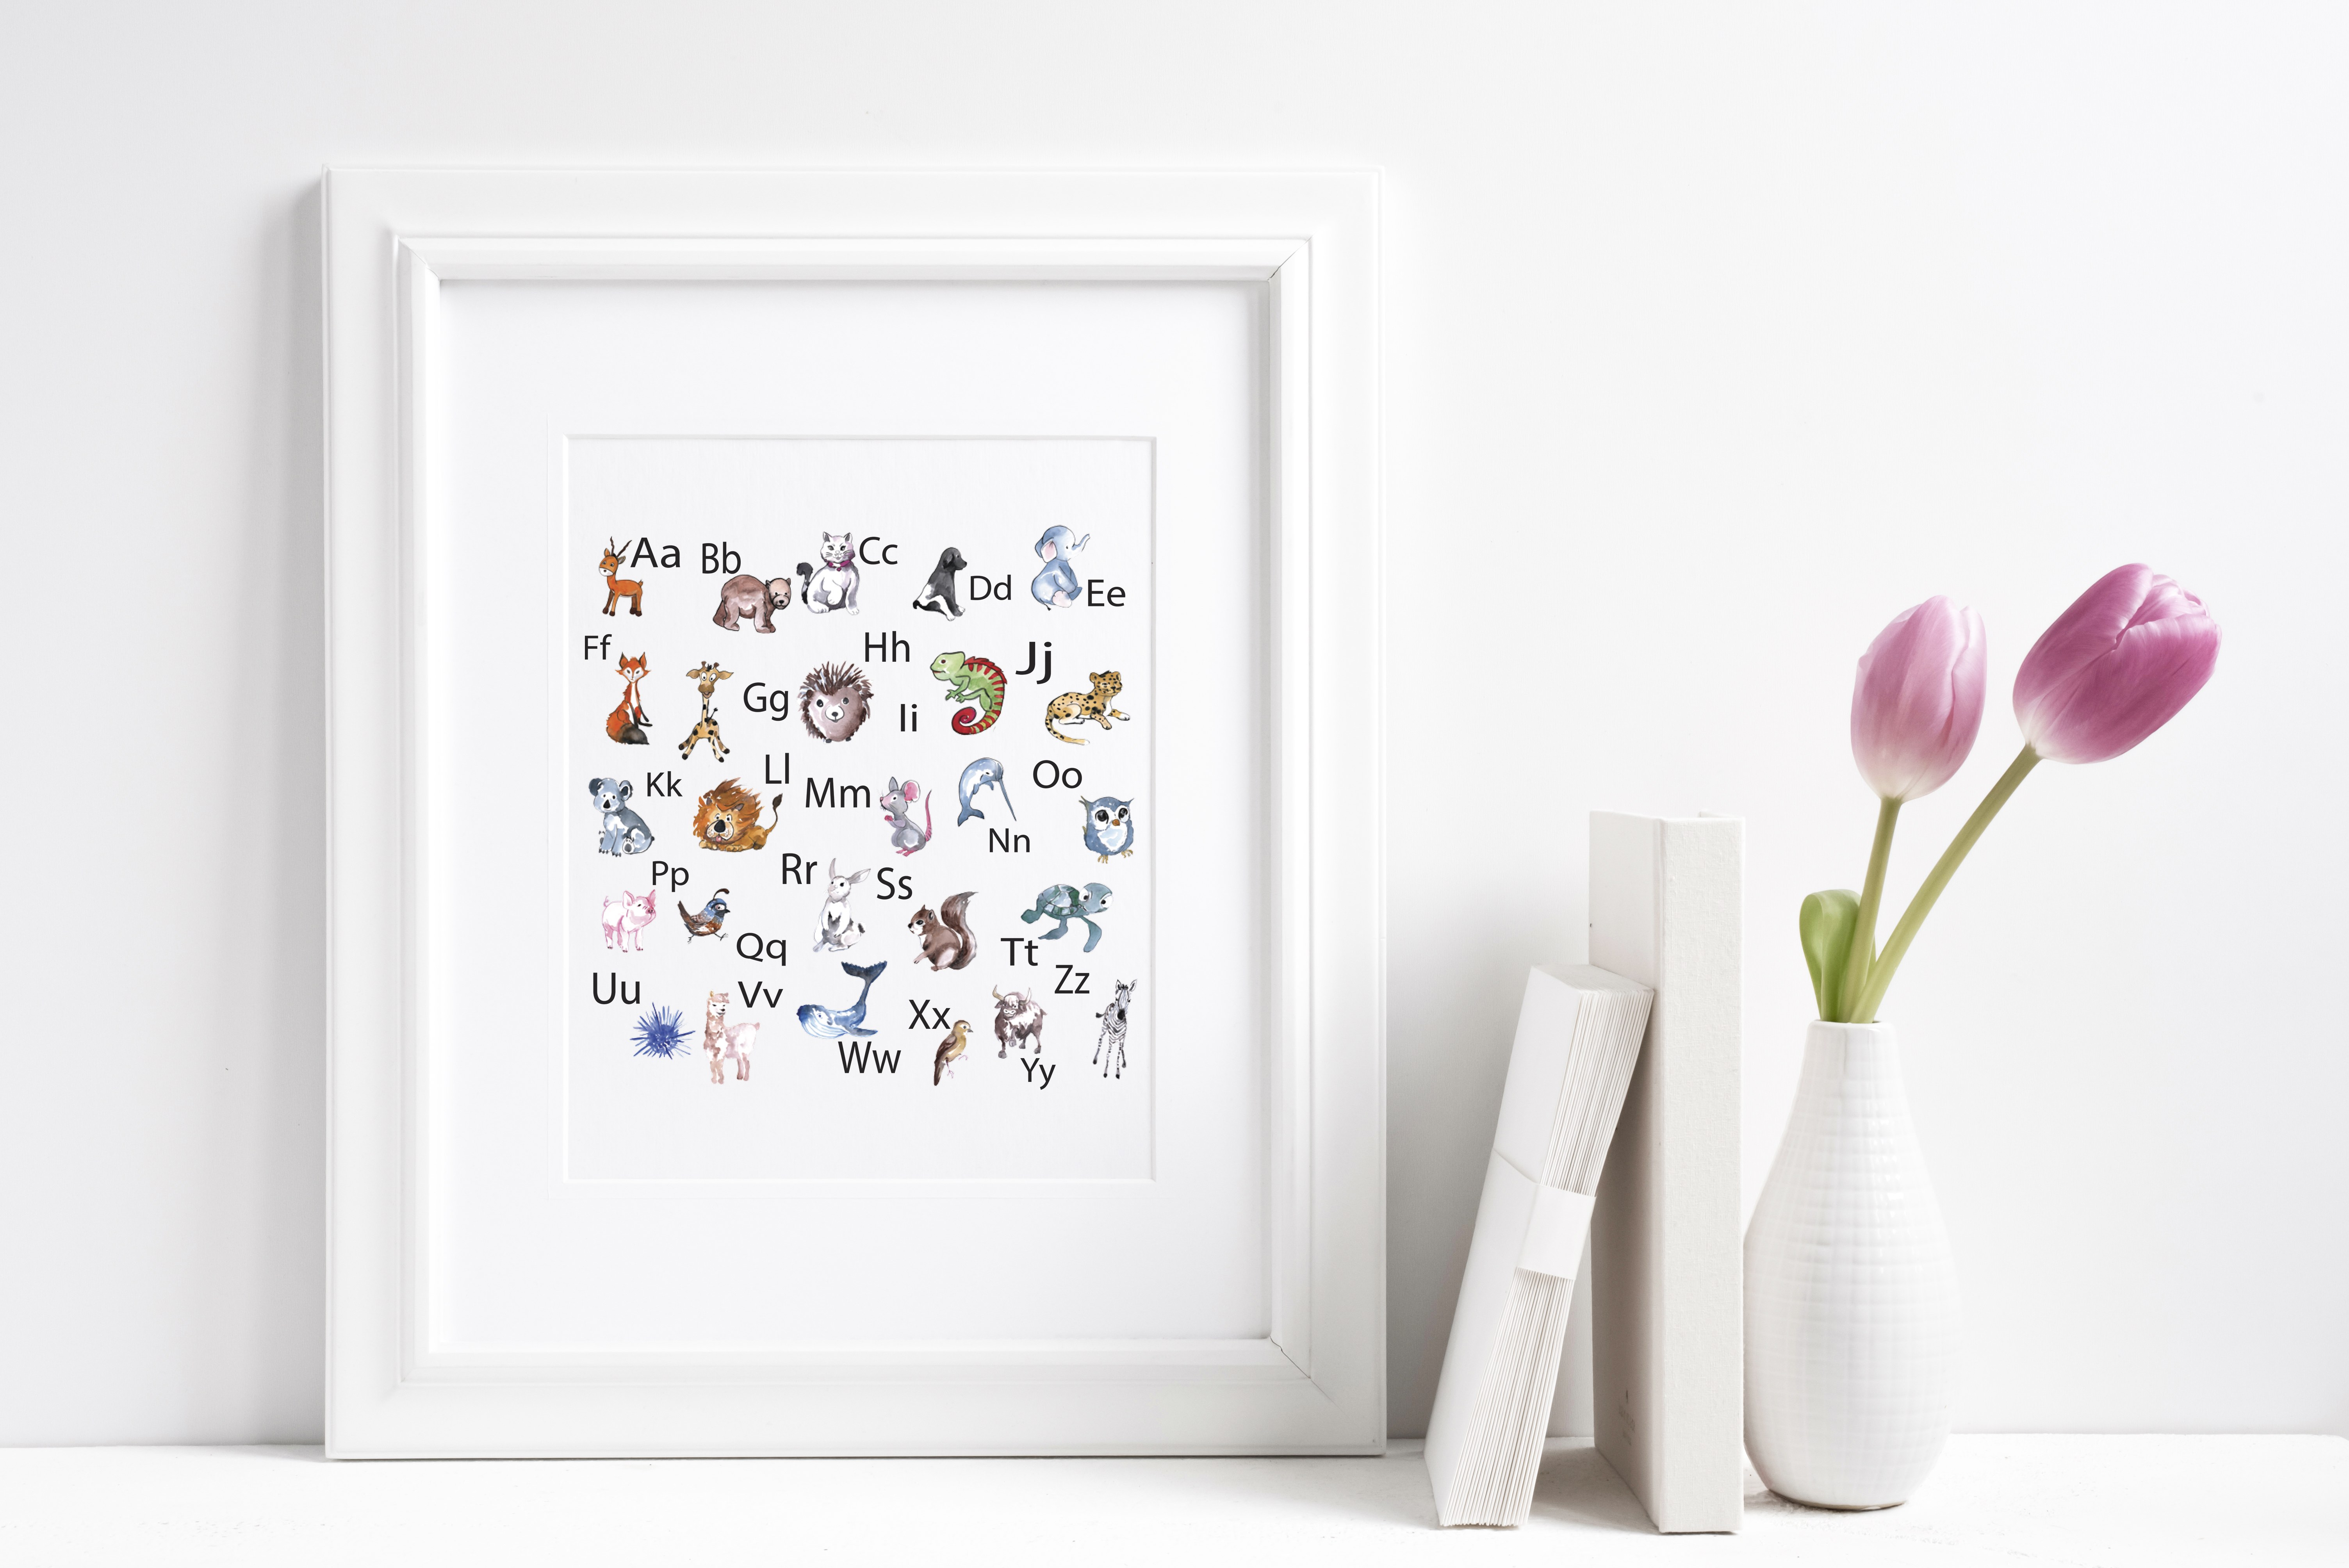 Alphabet Art Books and Flower